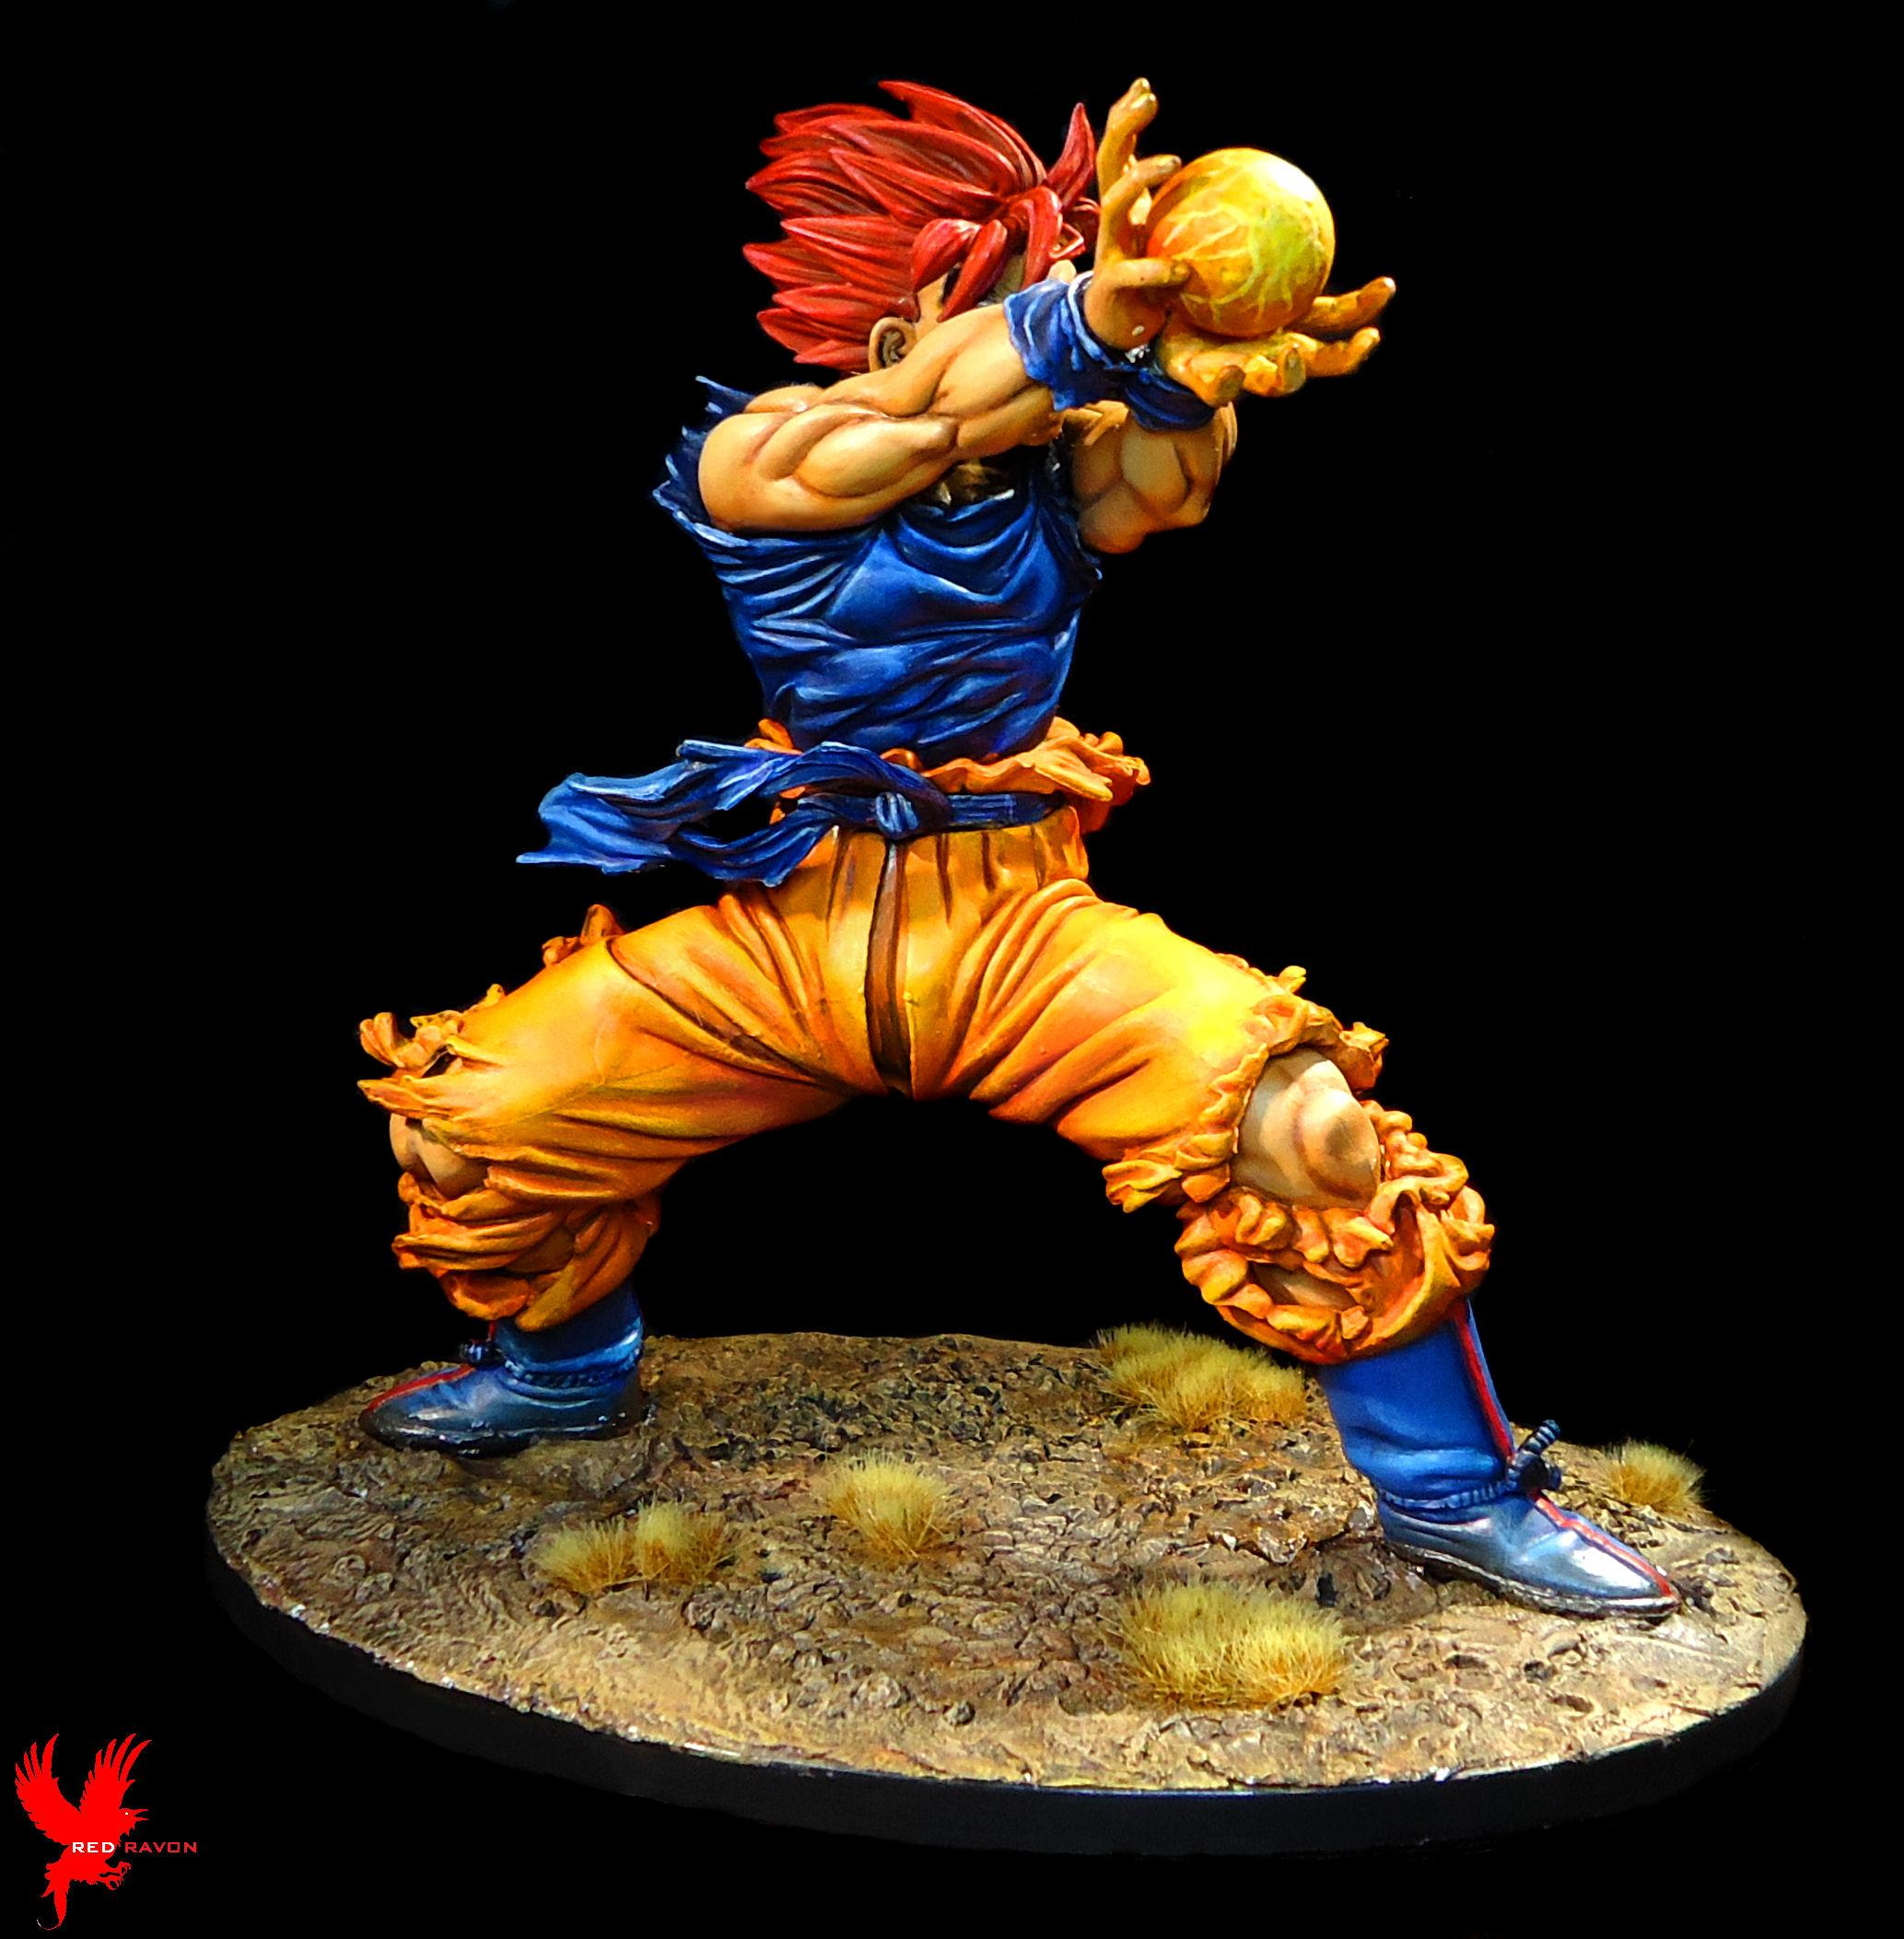 Cartoon, Commission, Dbz, Dragonball Z, Goku, Japanese, Make Over, Super Saiyan, Toy